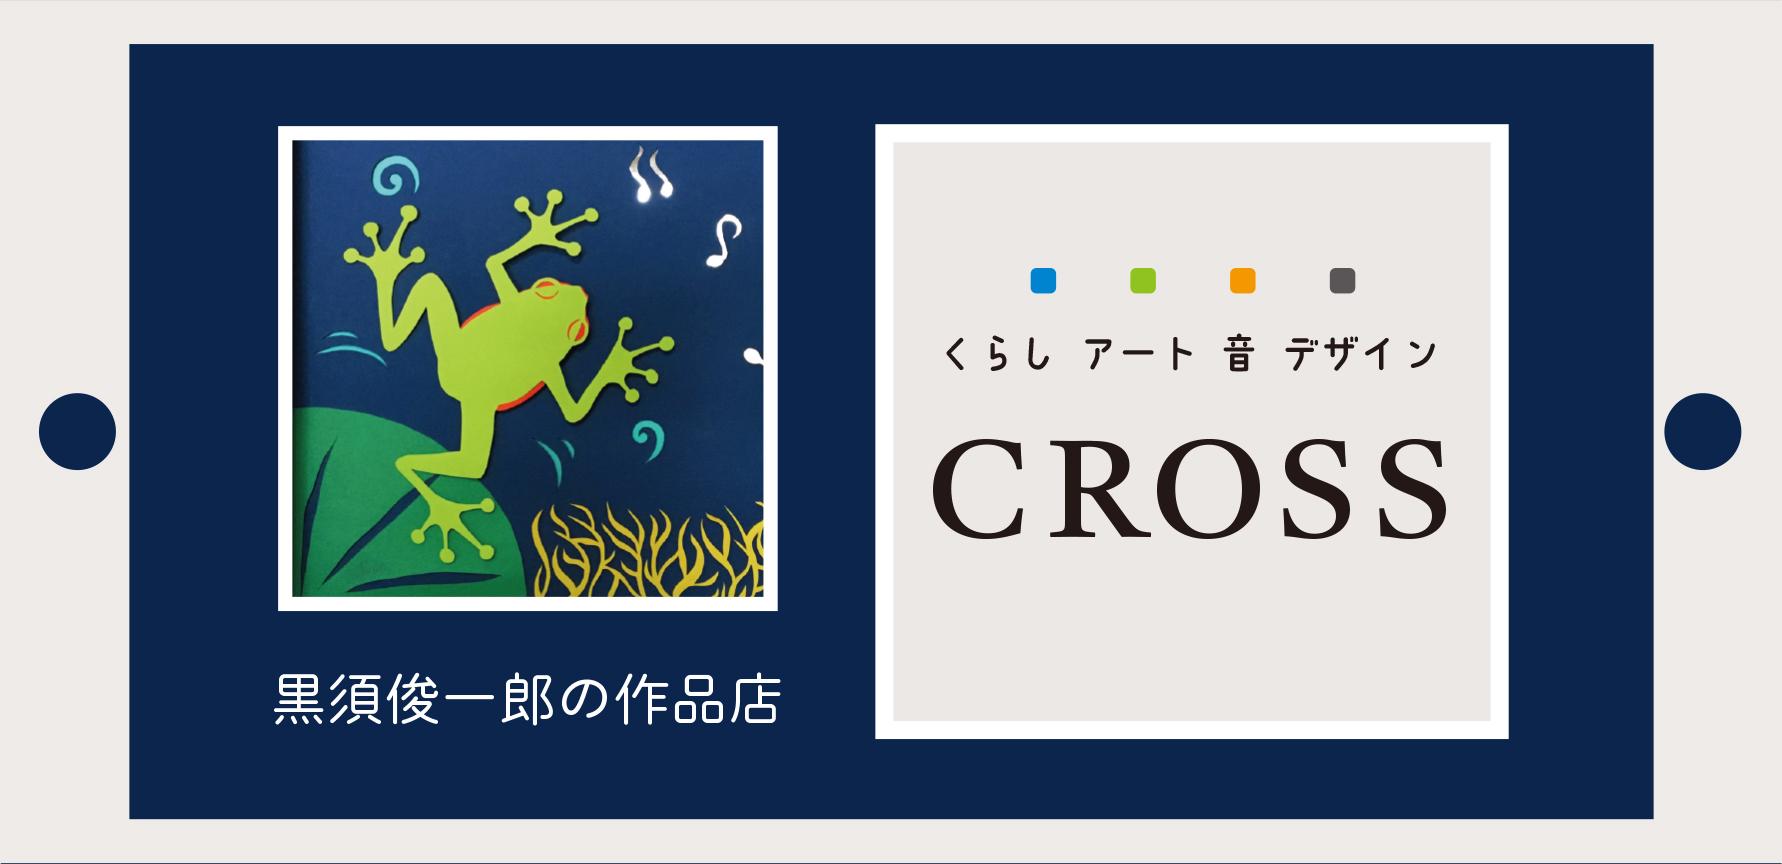 CROSS [ 暮らし・アート・音・デザイン 黒須俊一郎の作品店 ]